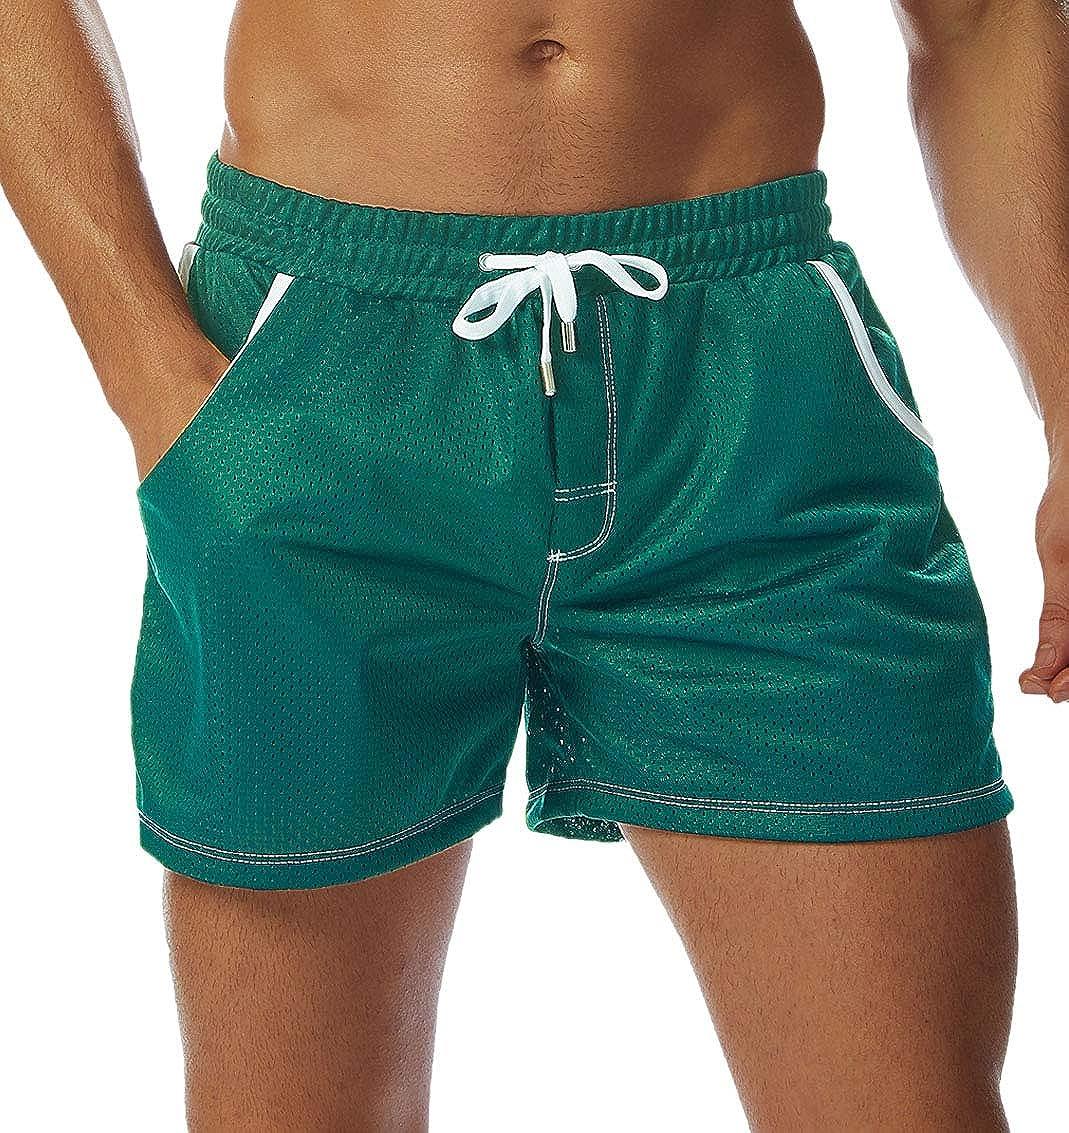 80s Men's Clothing | Shirts, Jeans, Jackets for Guys SILKWORLD Men's Mesh Short Athletic Shorts with Pockets $14.99 AT vintagedancer.com